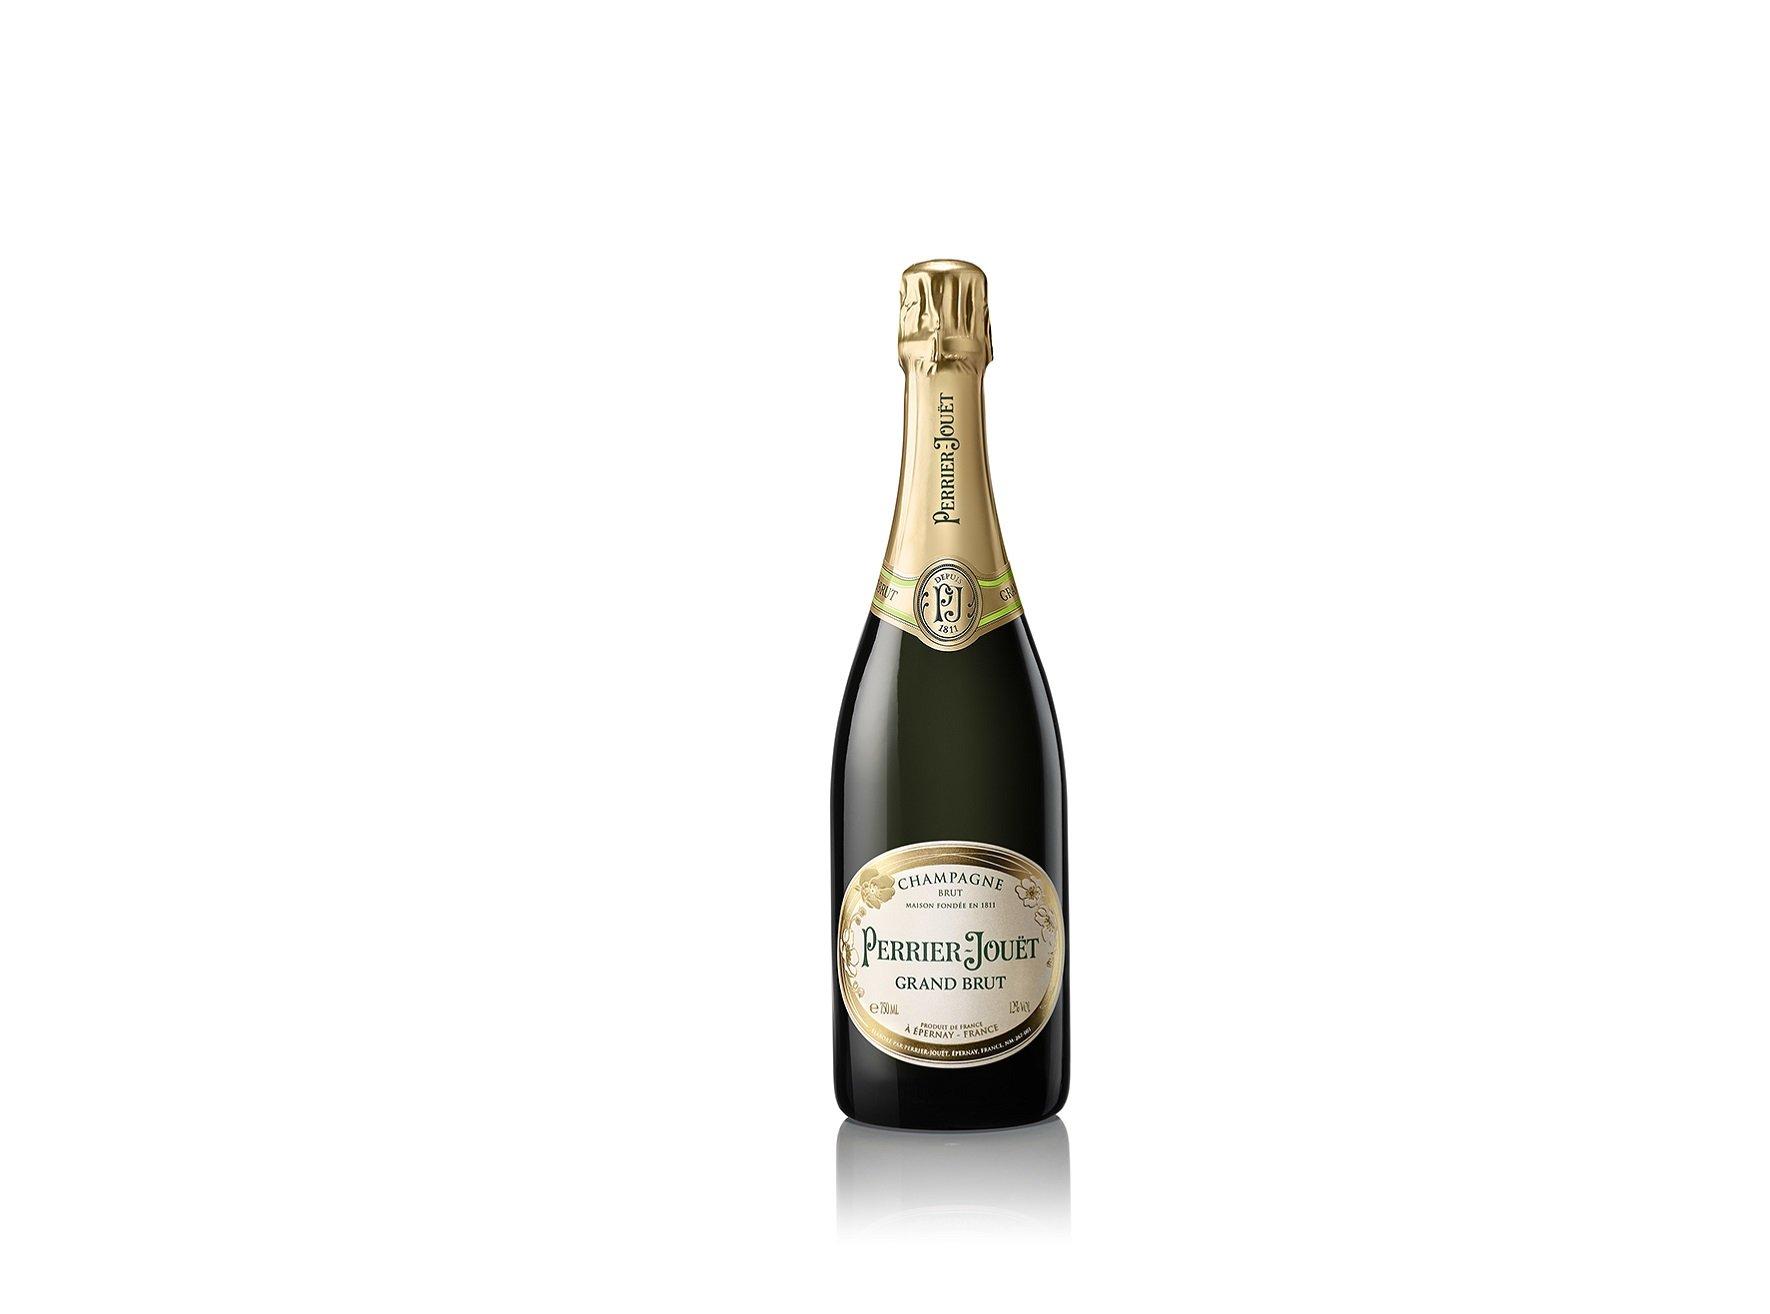 Perrier-Jouet-Grand-Brut-Champagner